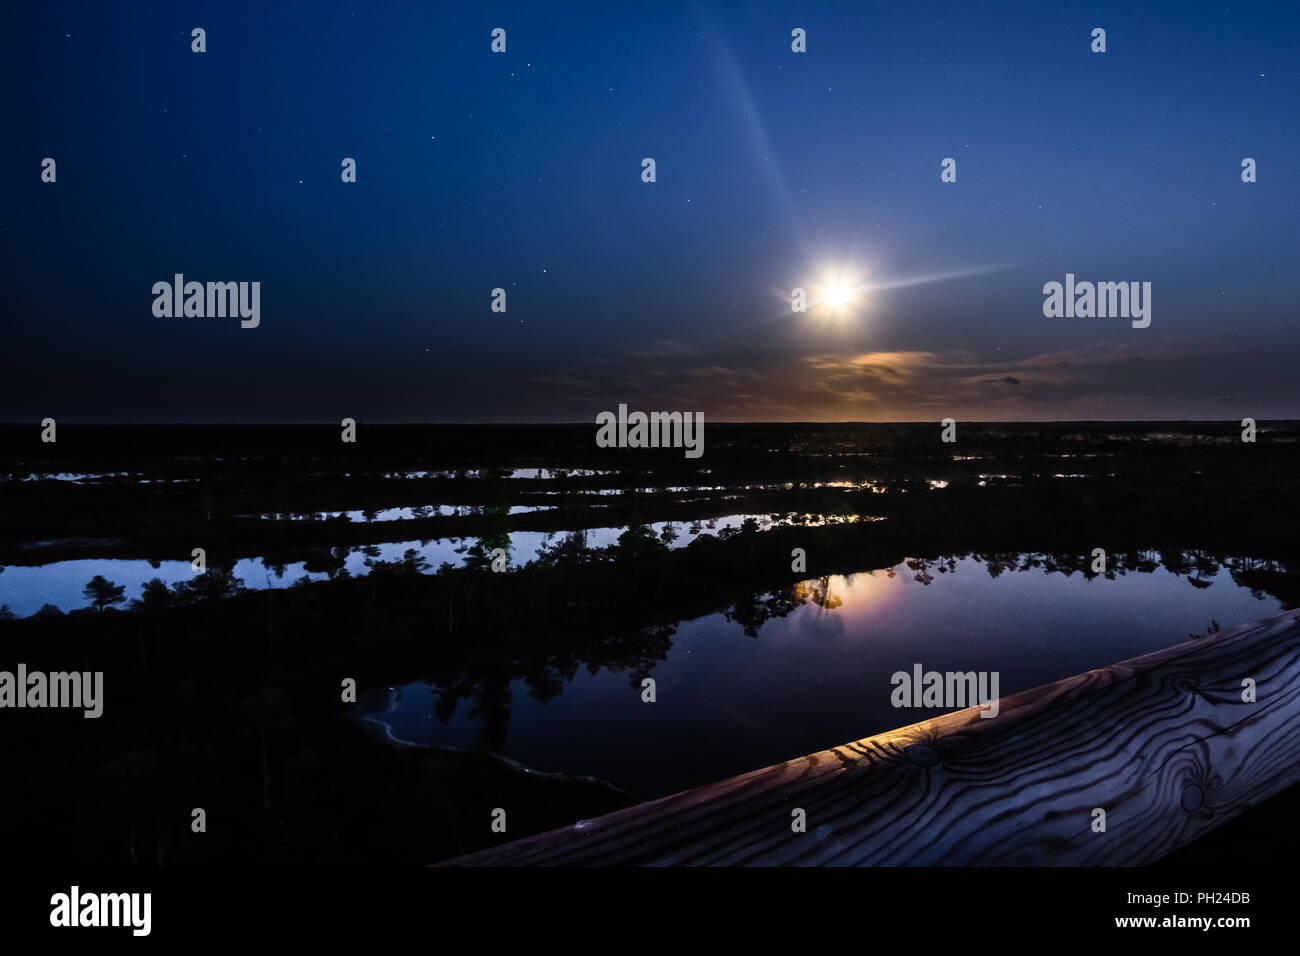 Kemeru swamp in Latvia. A night in June. - Stock Image